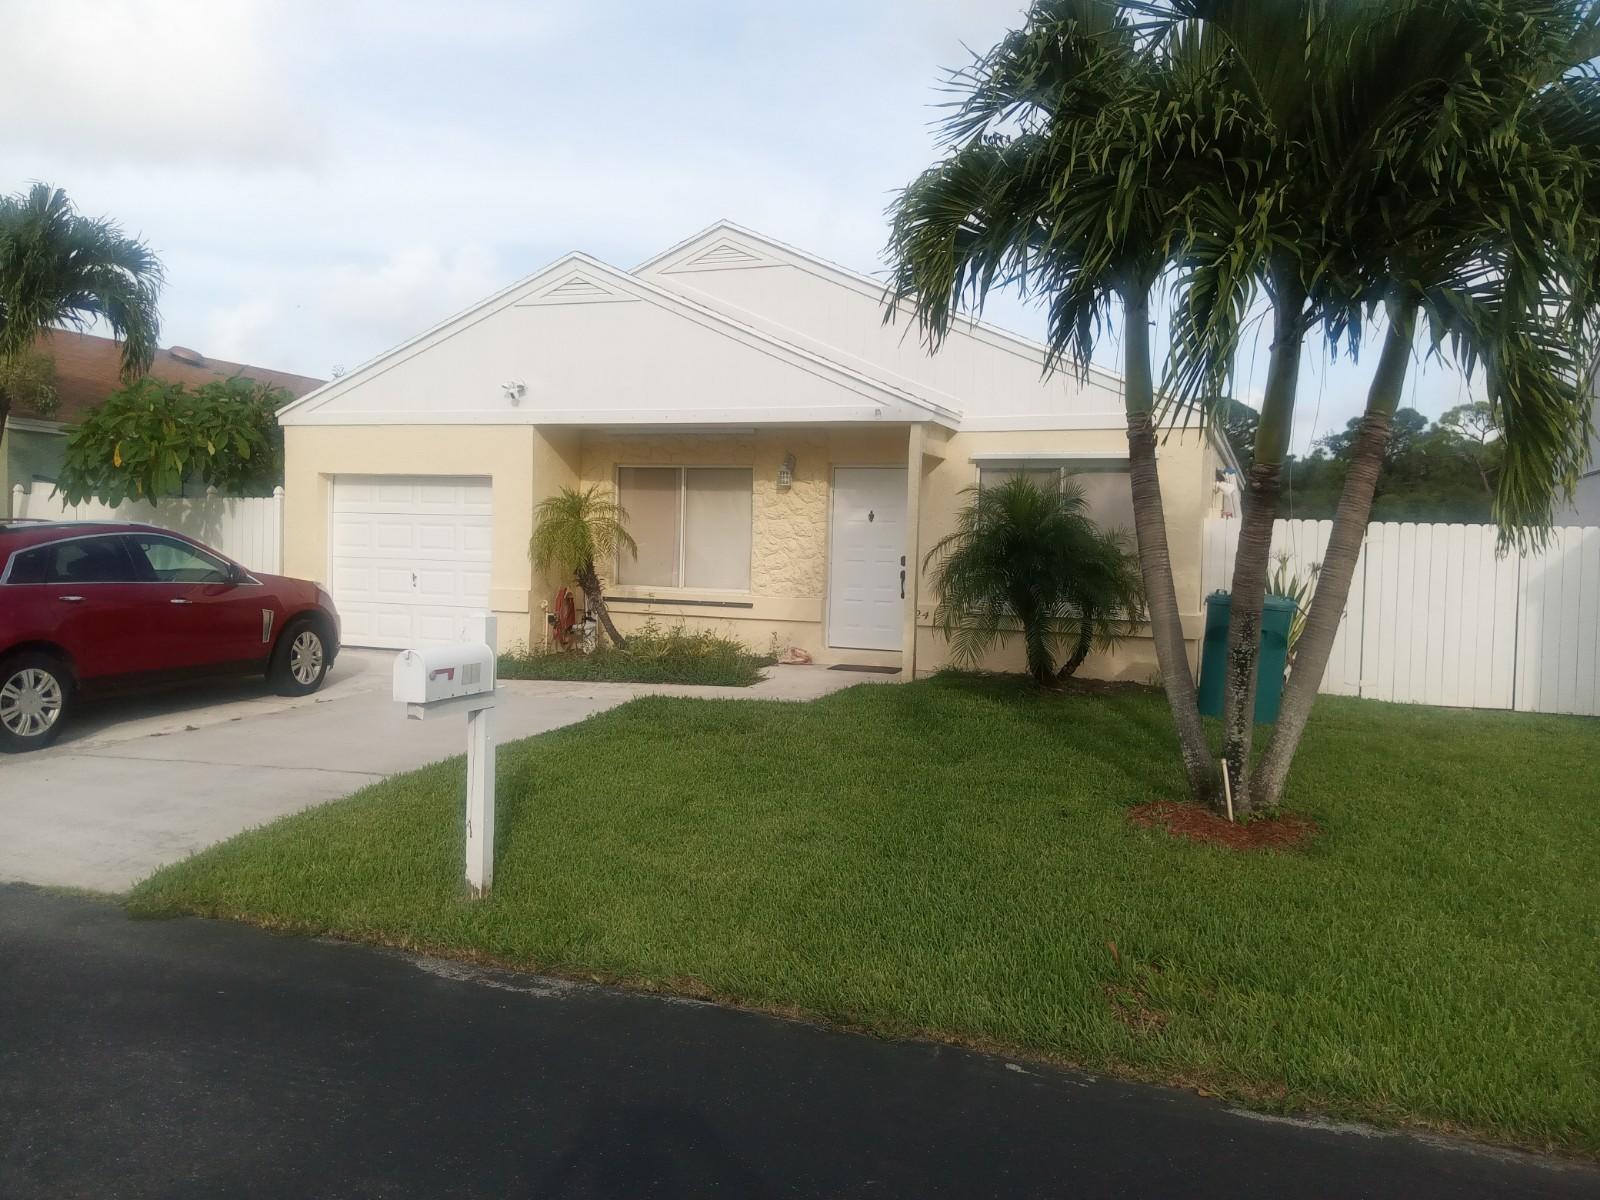 24 Hastings Lane, Boynton Beach, FL 33426